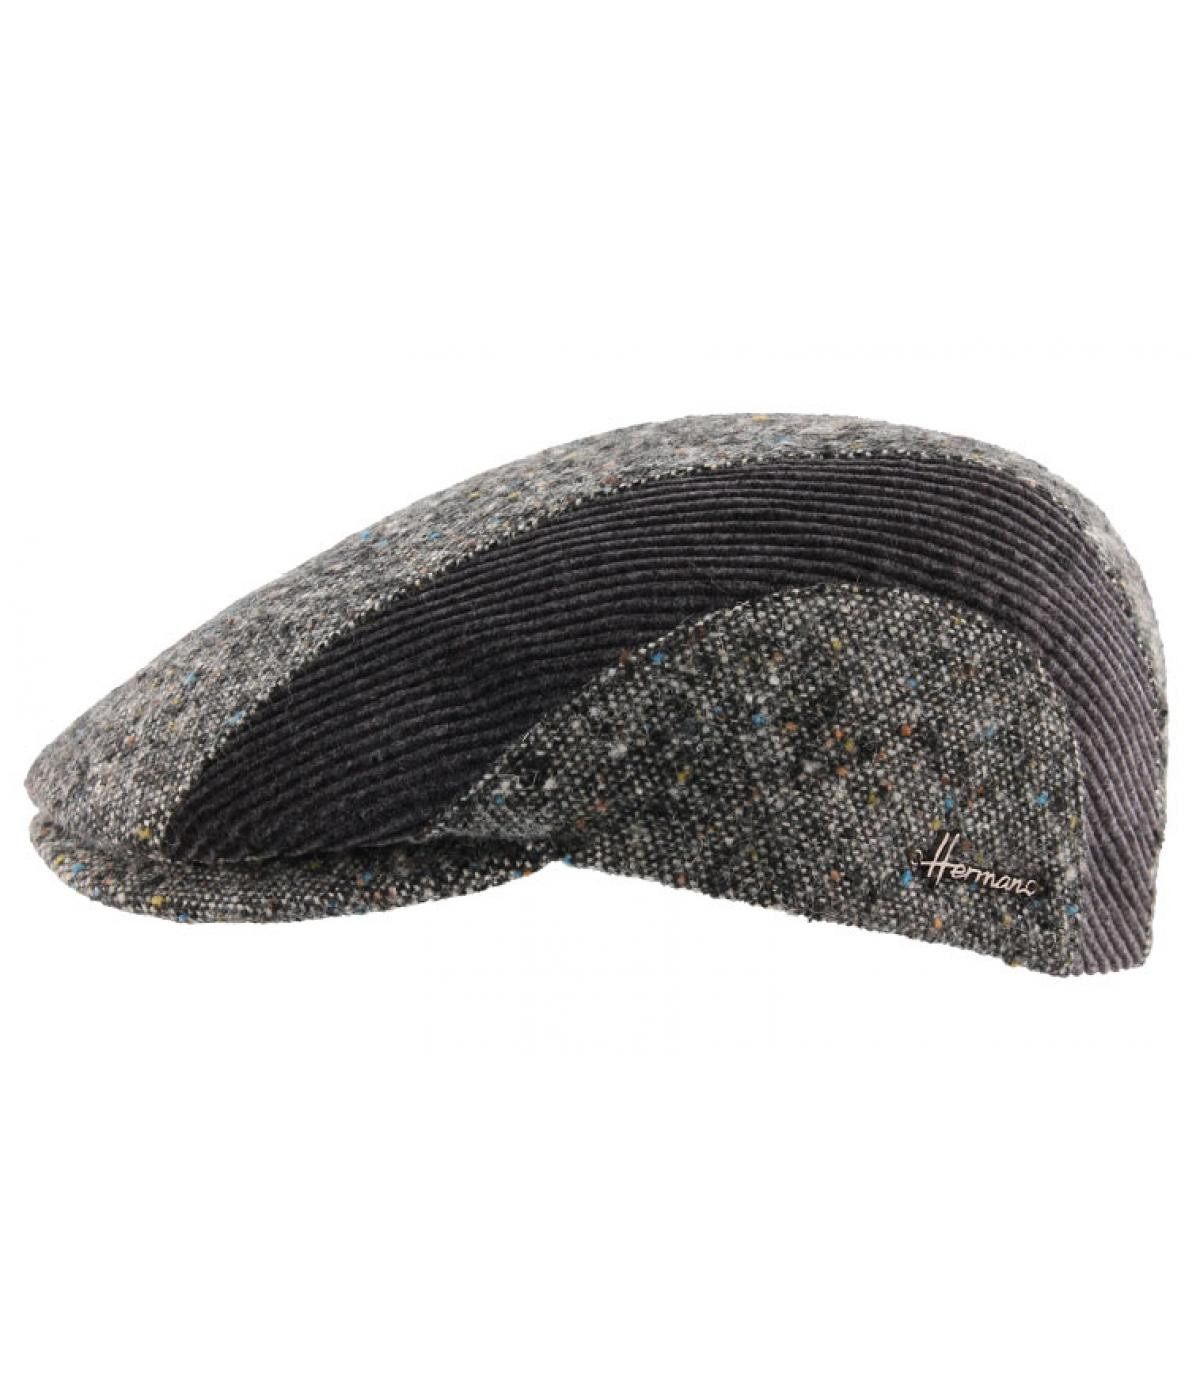 Details Range Wool Corduroy grey - Abbildung 2